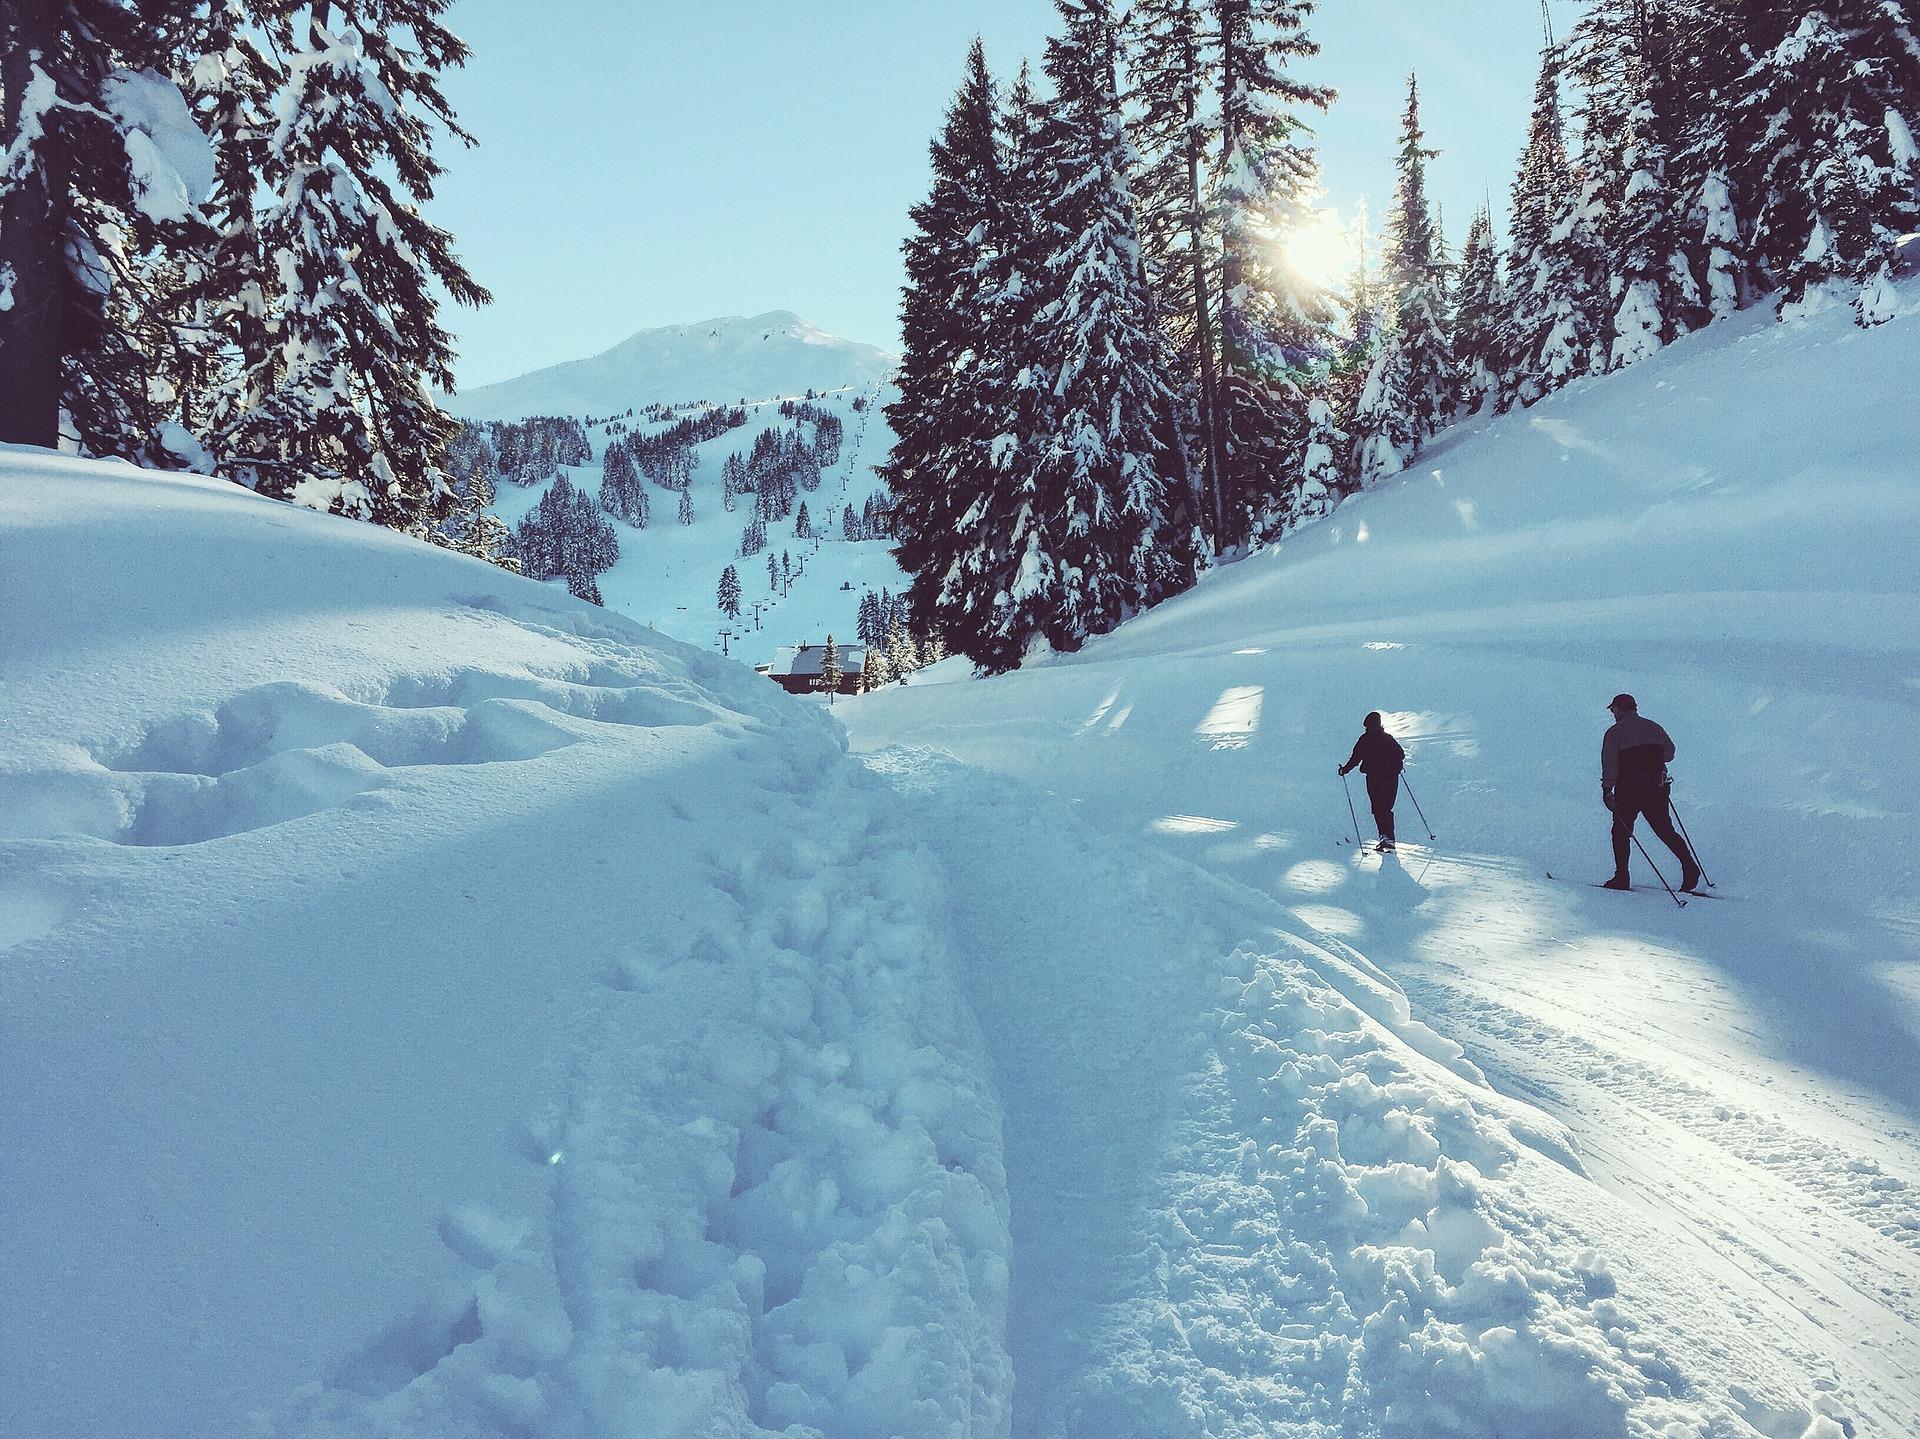 ski 1415996 1920 The Best Ski Resorts in the Western United States